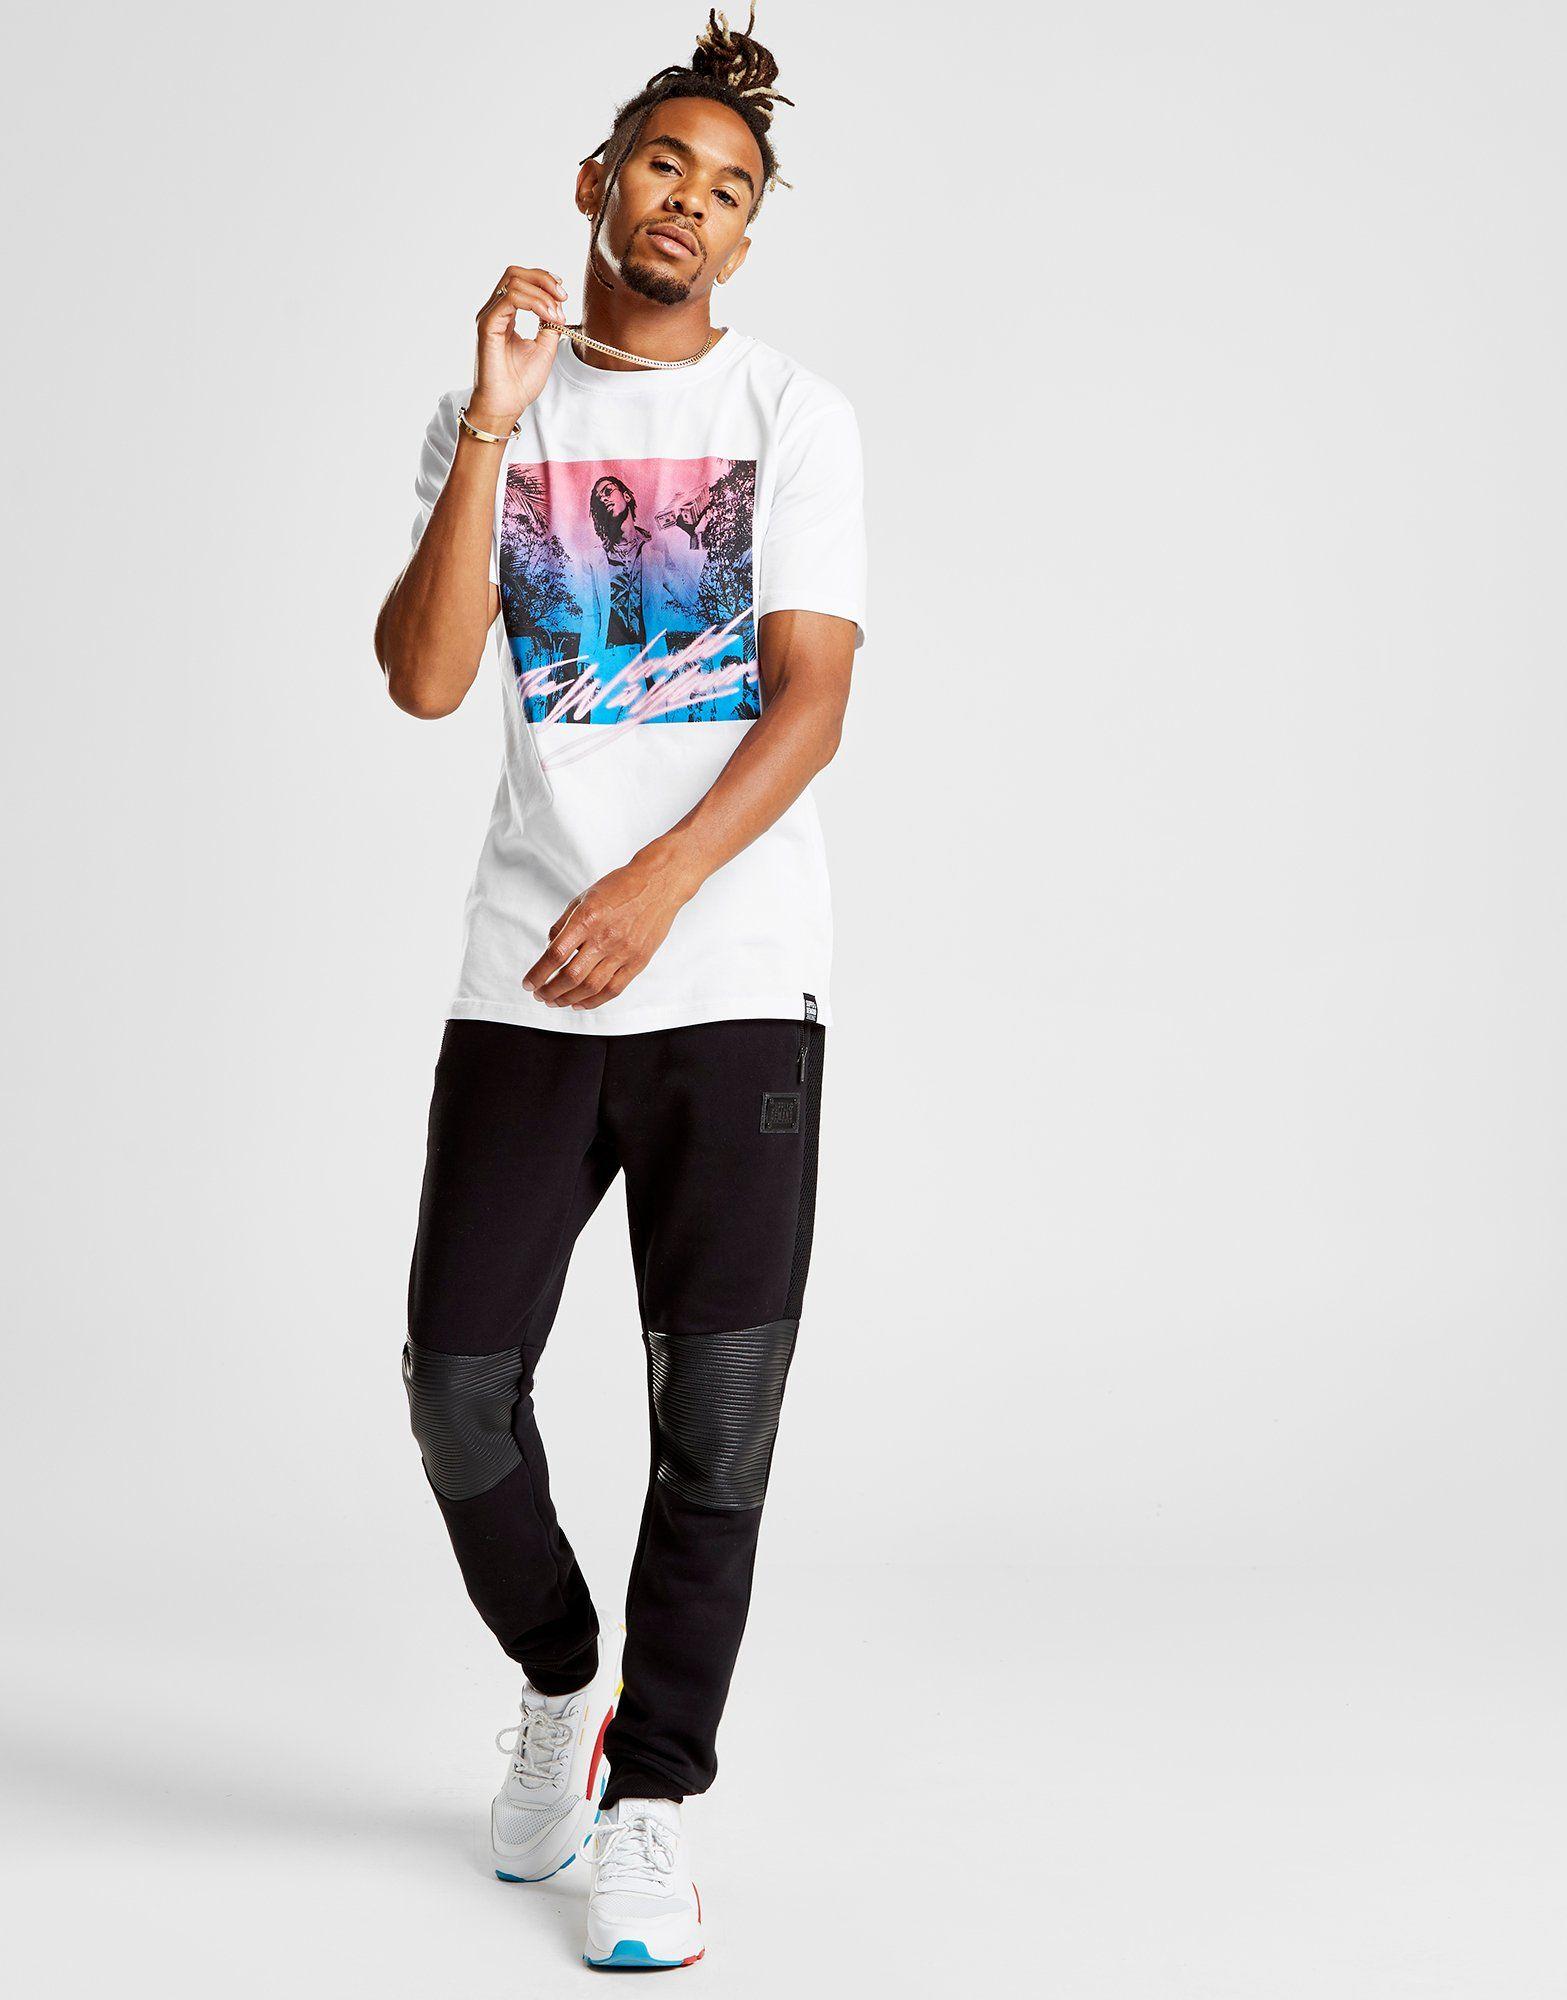 Supply & Demand Rich The Kid T-Shirt